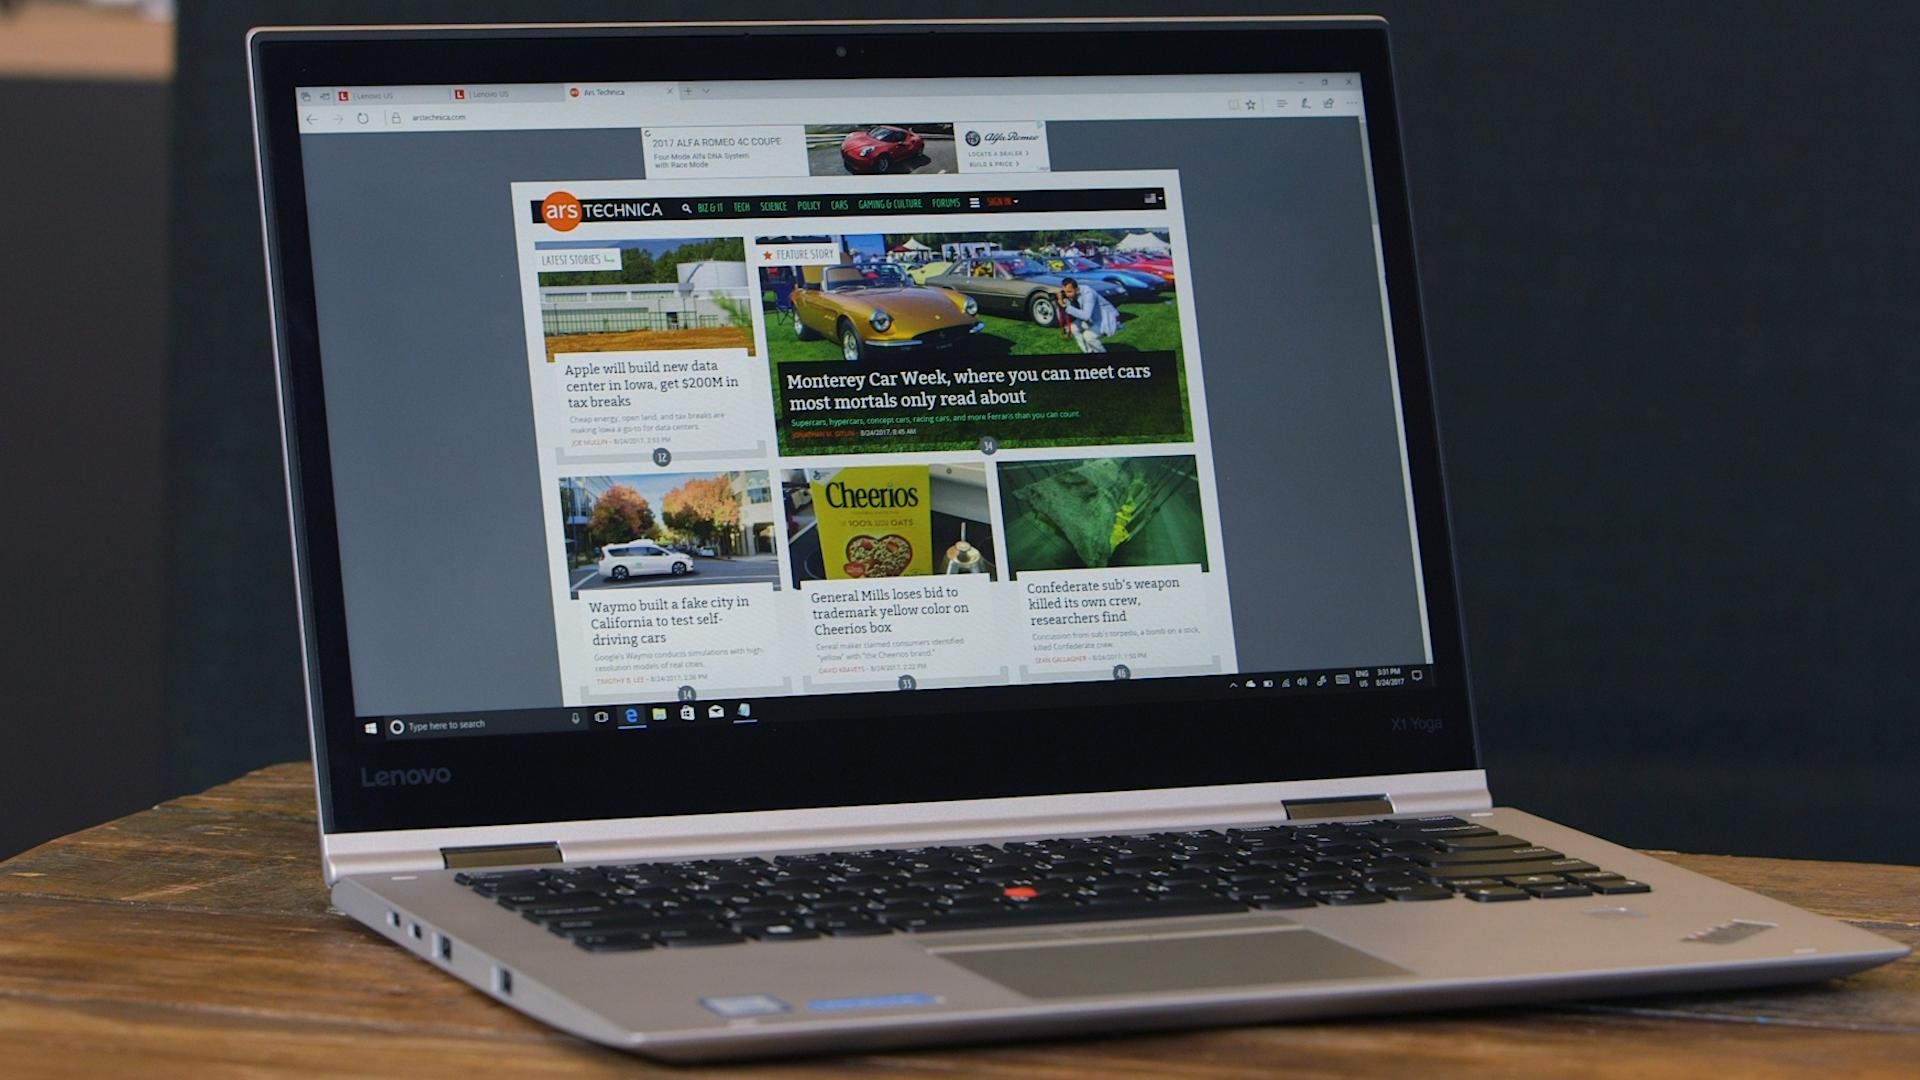 how to turn on lenovo yoga laptop